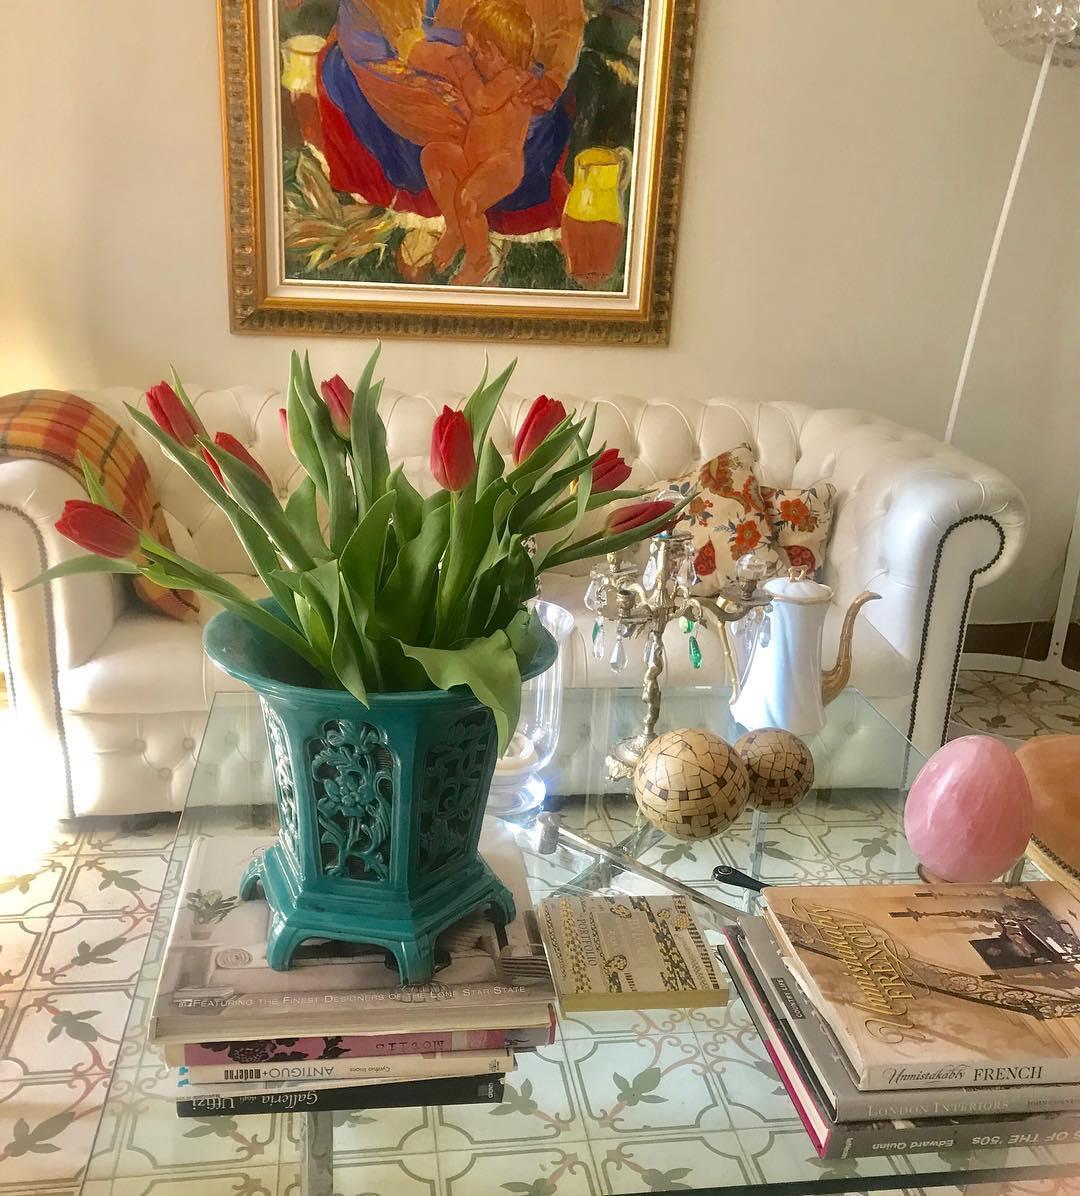 A primavera está chegando, tulipas frescas fazem o meu dia! # decoracióndeinteriores #decor ...